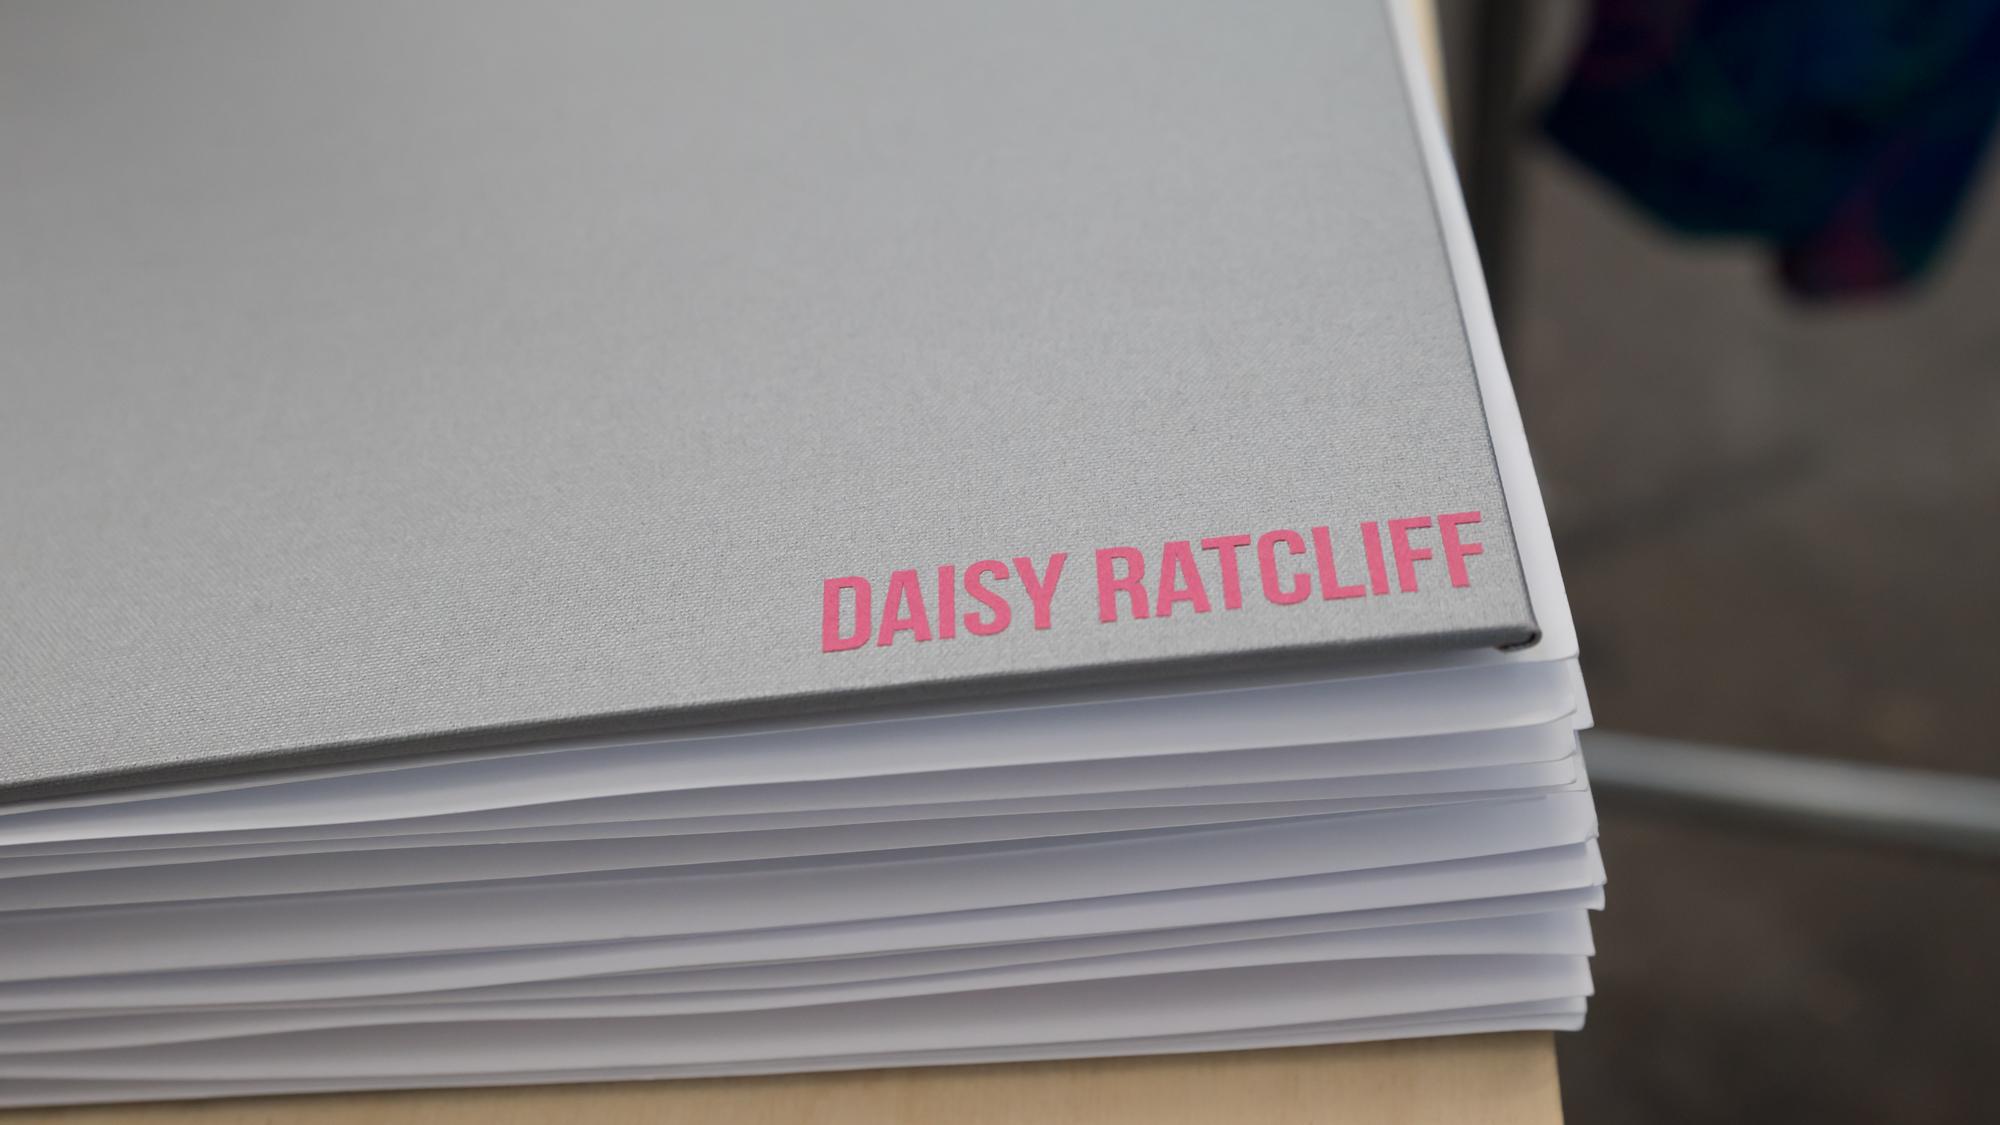 Daisy Ratcliff Northumbria Uni ImageByWilBarker-7.jpg